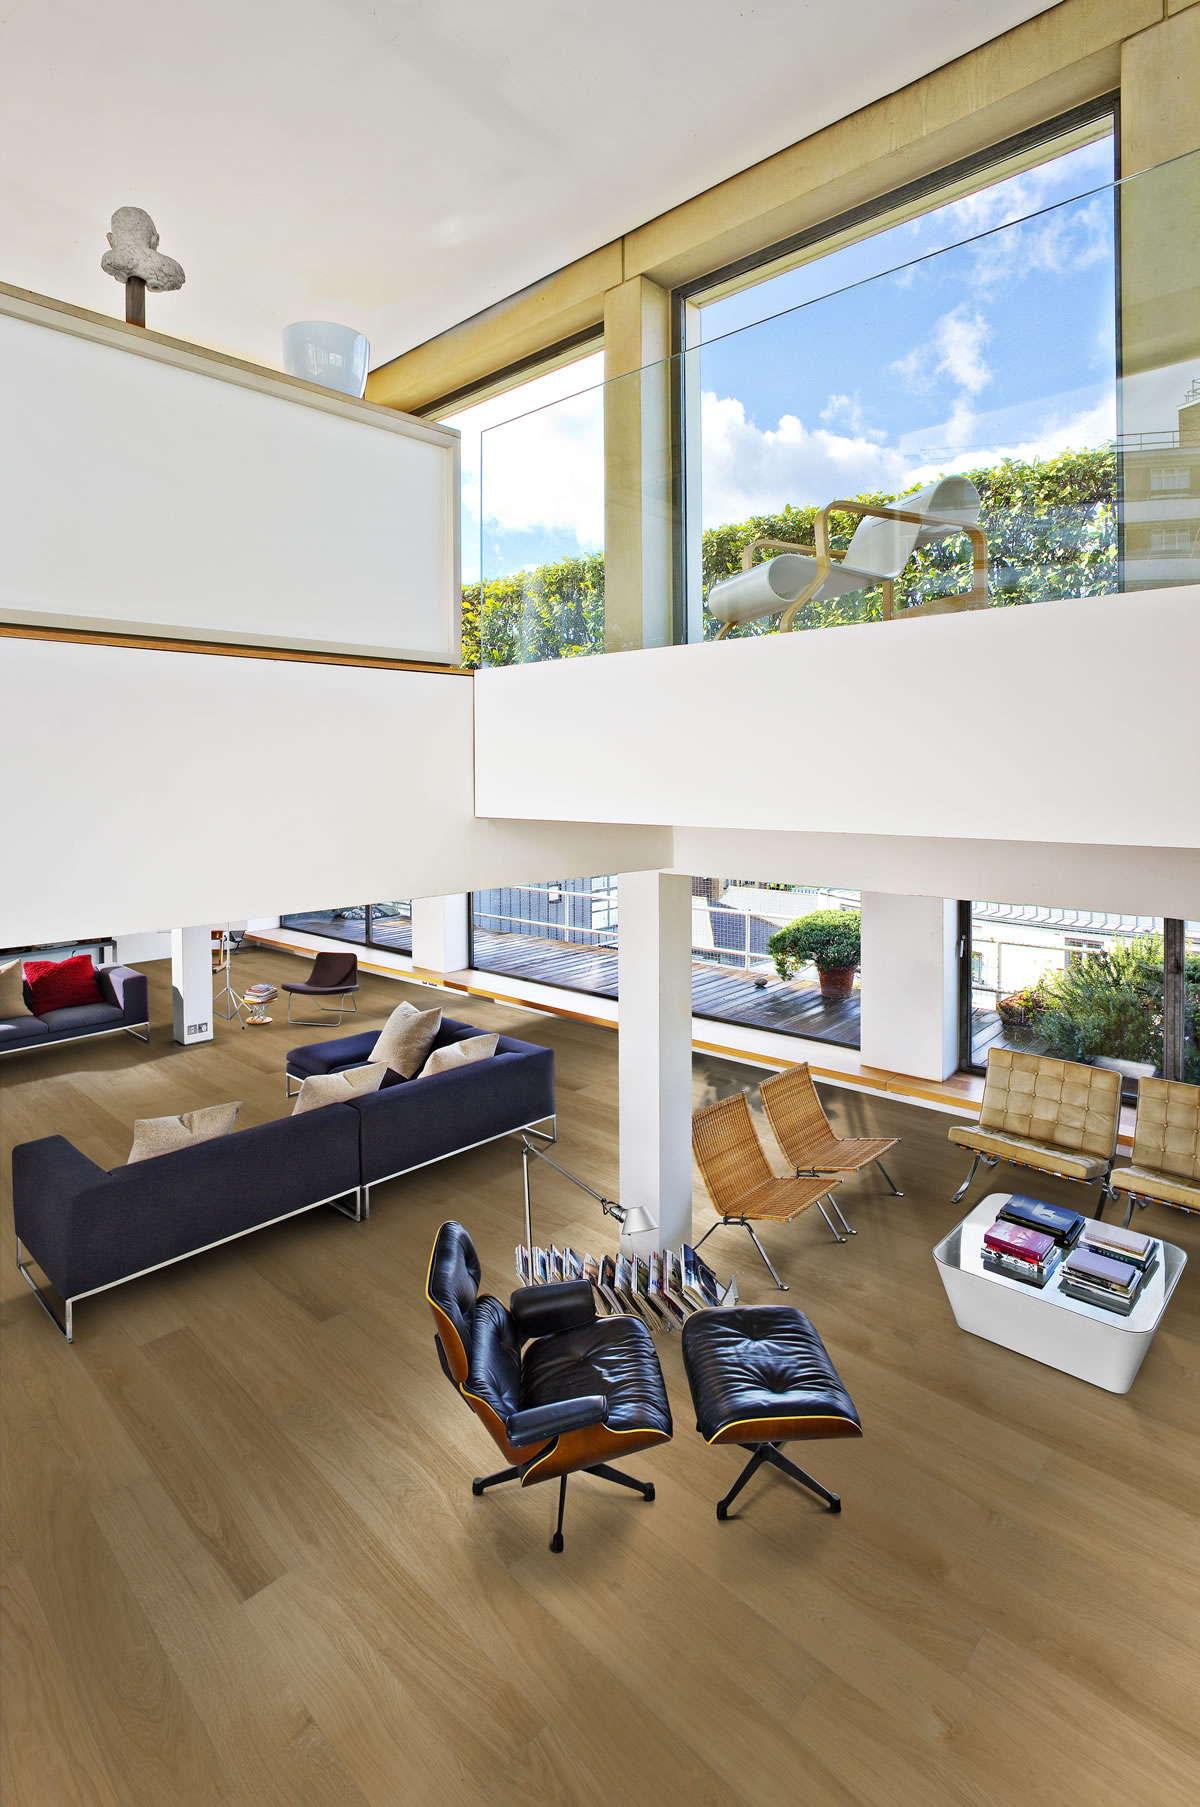 Kahrs oak dublin engineered wood flooring for Hardwood floors dublin